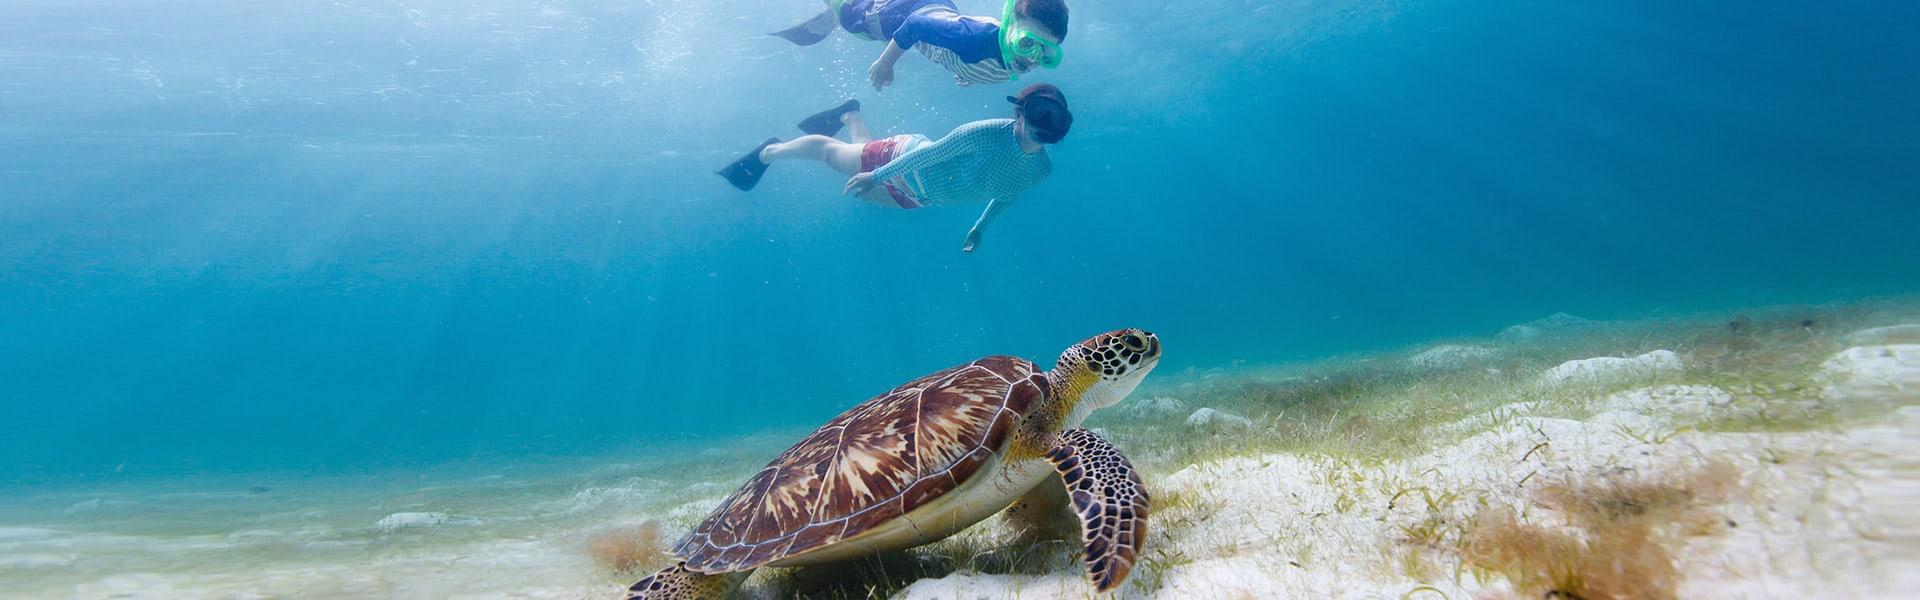 snorkeling-banner